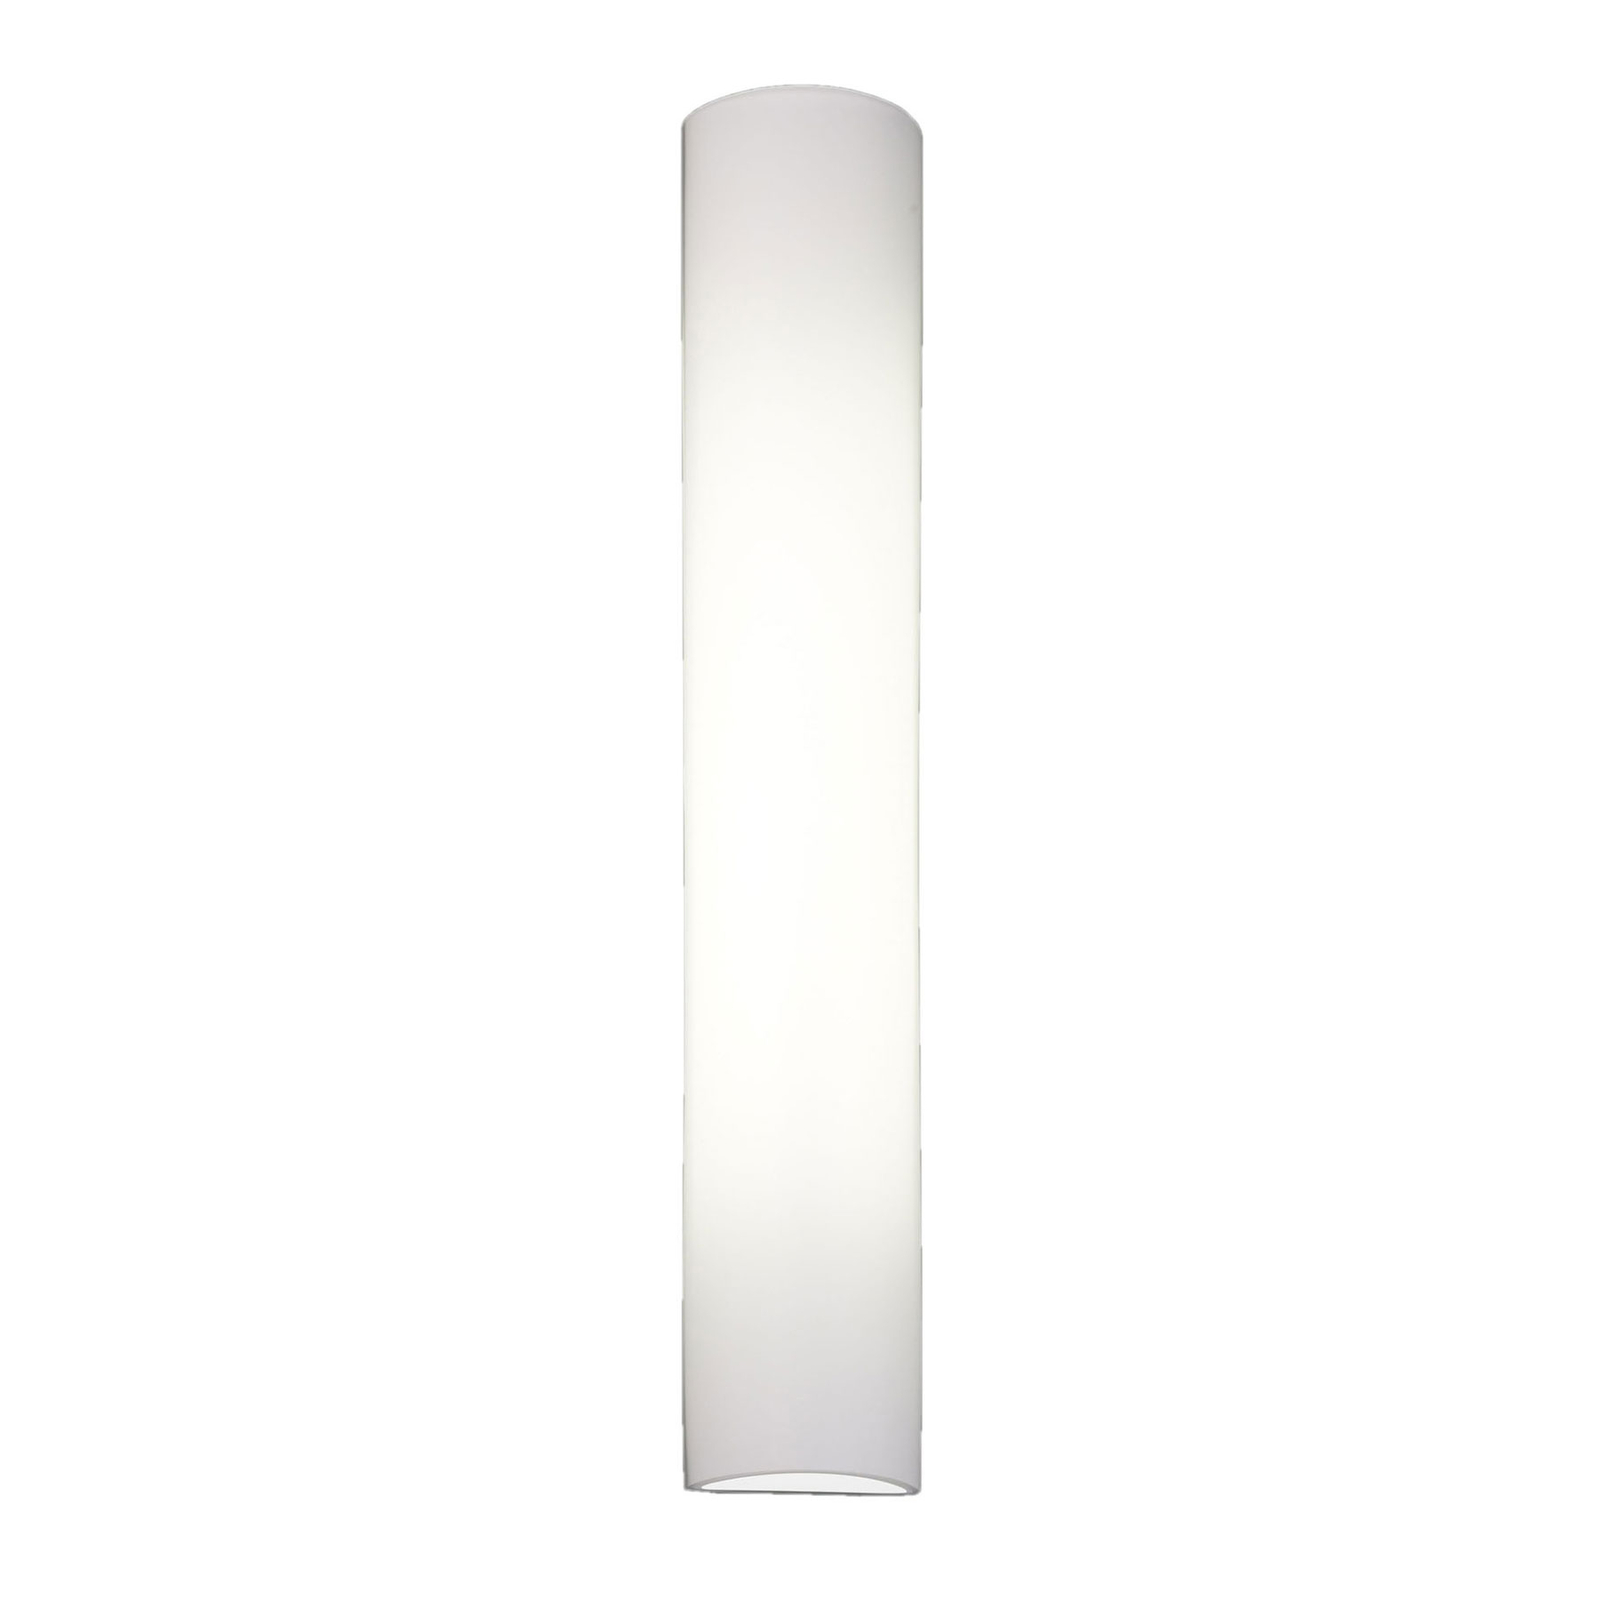 BANKAMP Cromo LED-Wandleuchte aus Glas, Höhe 40cm